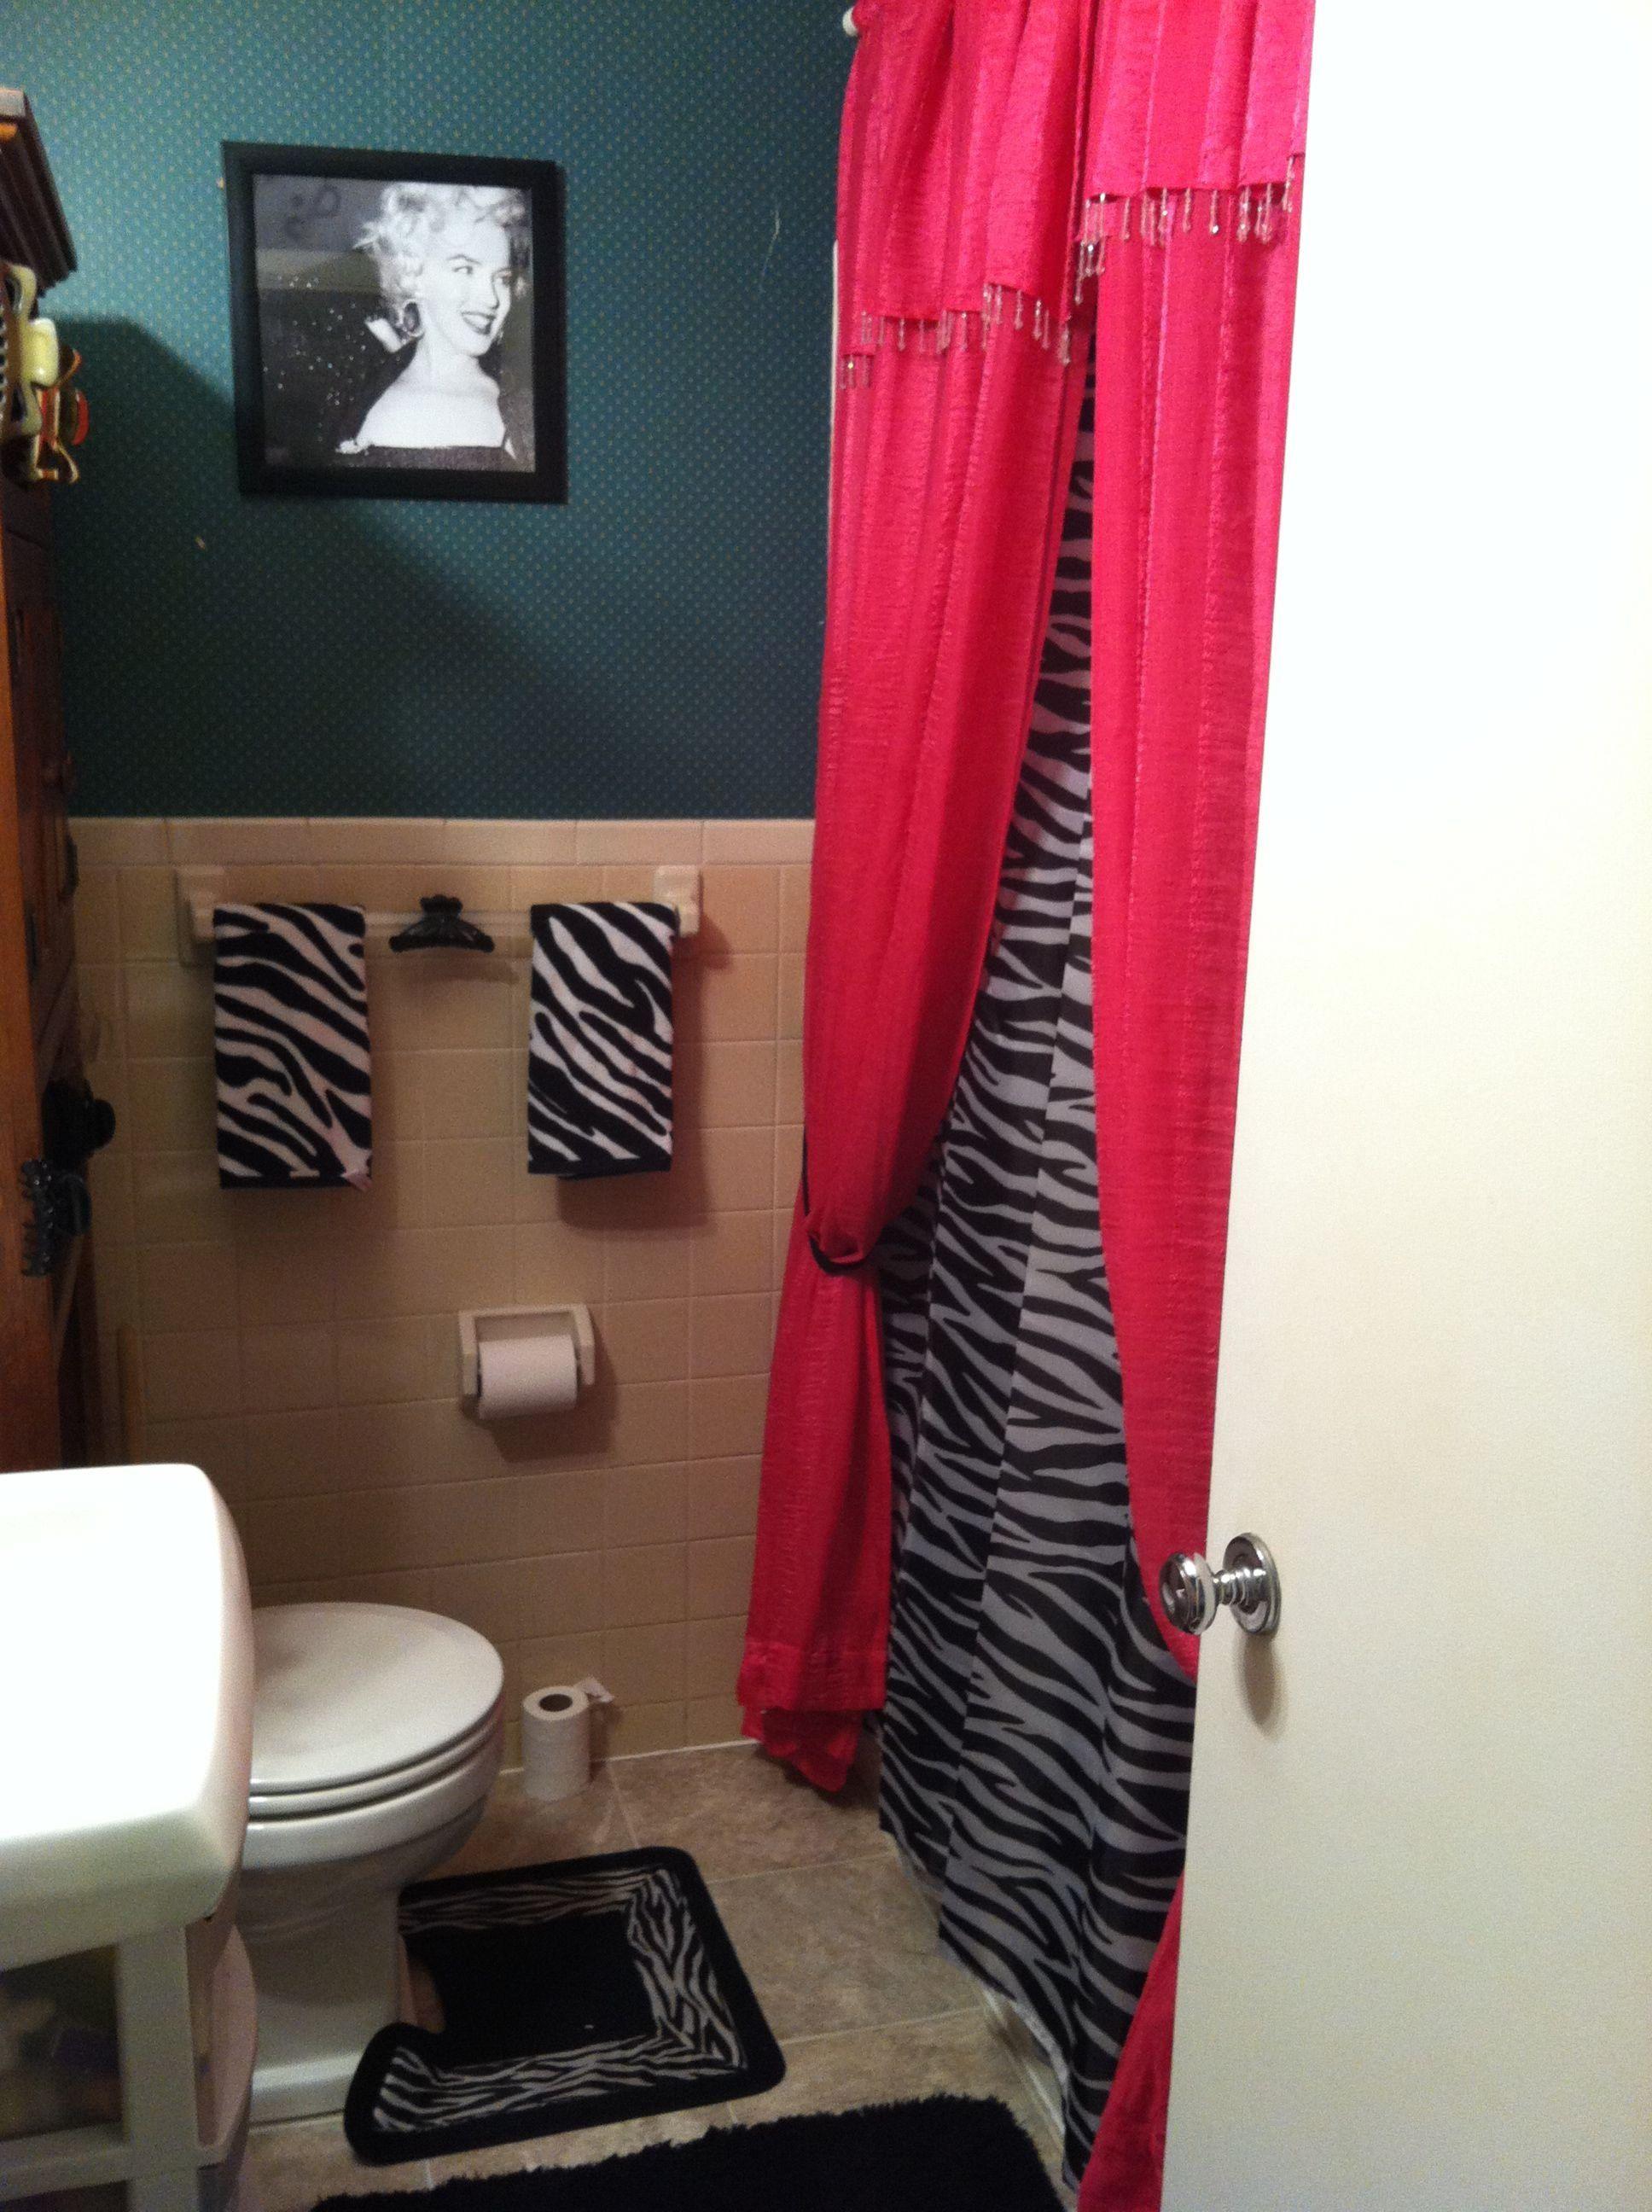 megans bathroom!!! :) Cute pink and zebra bathroom ...